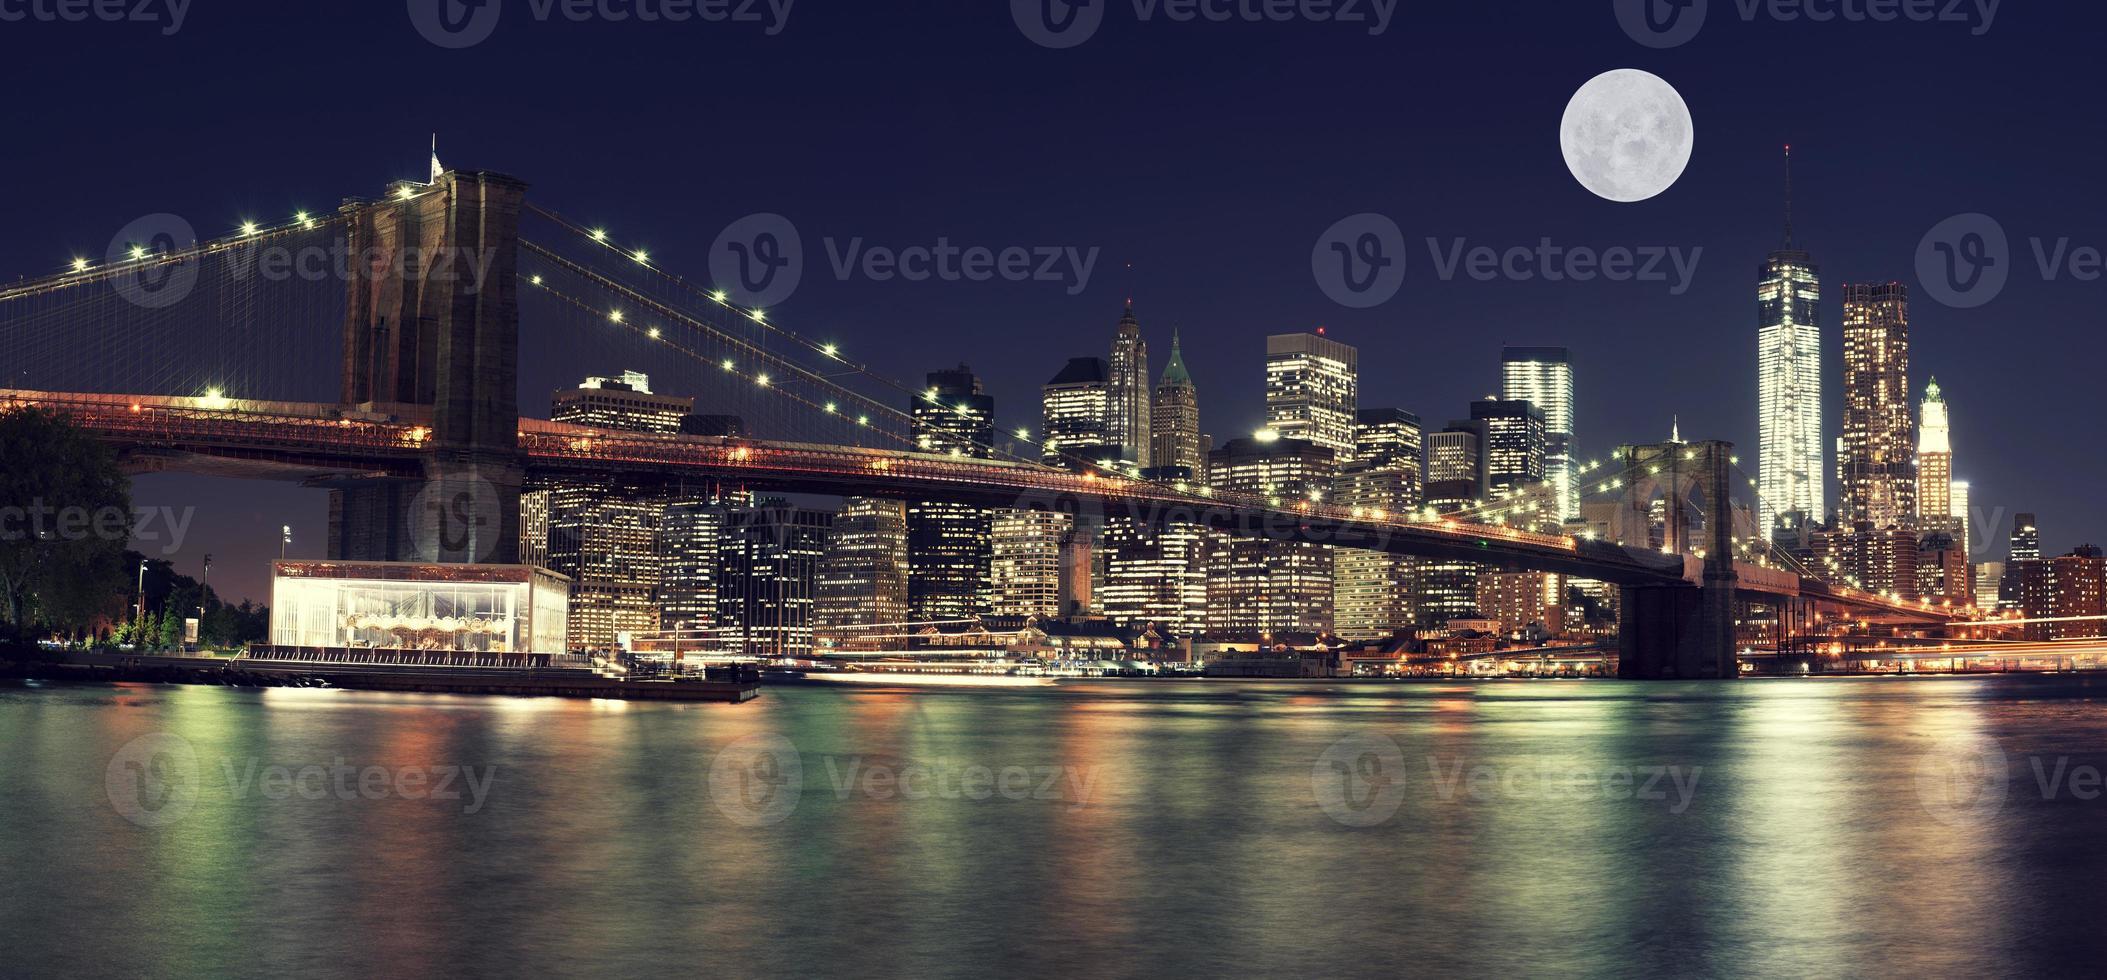 New York Skyline at night with Moon photo